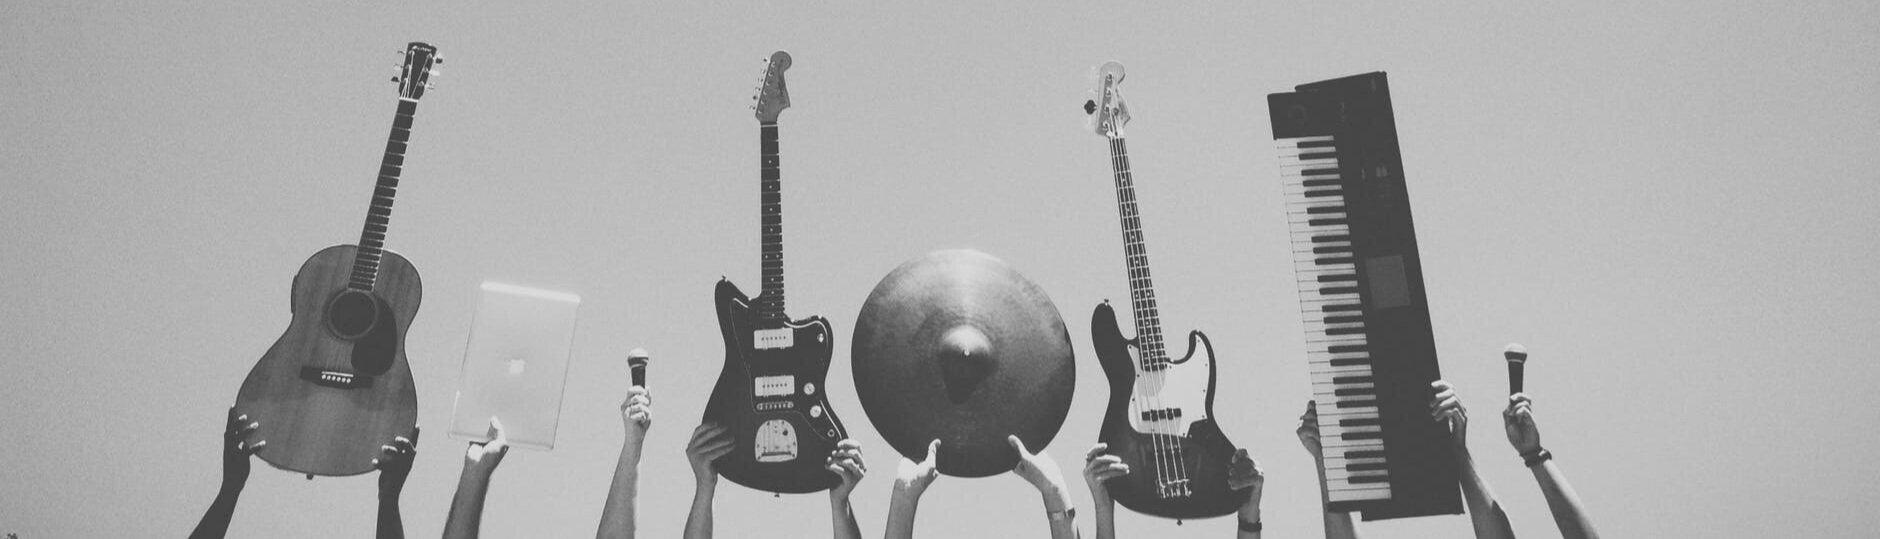 abstract-music-rock-bw.jpg